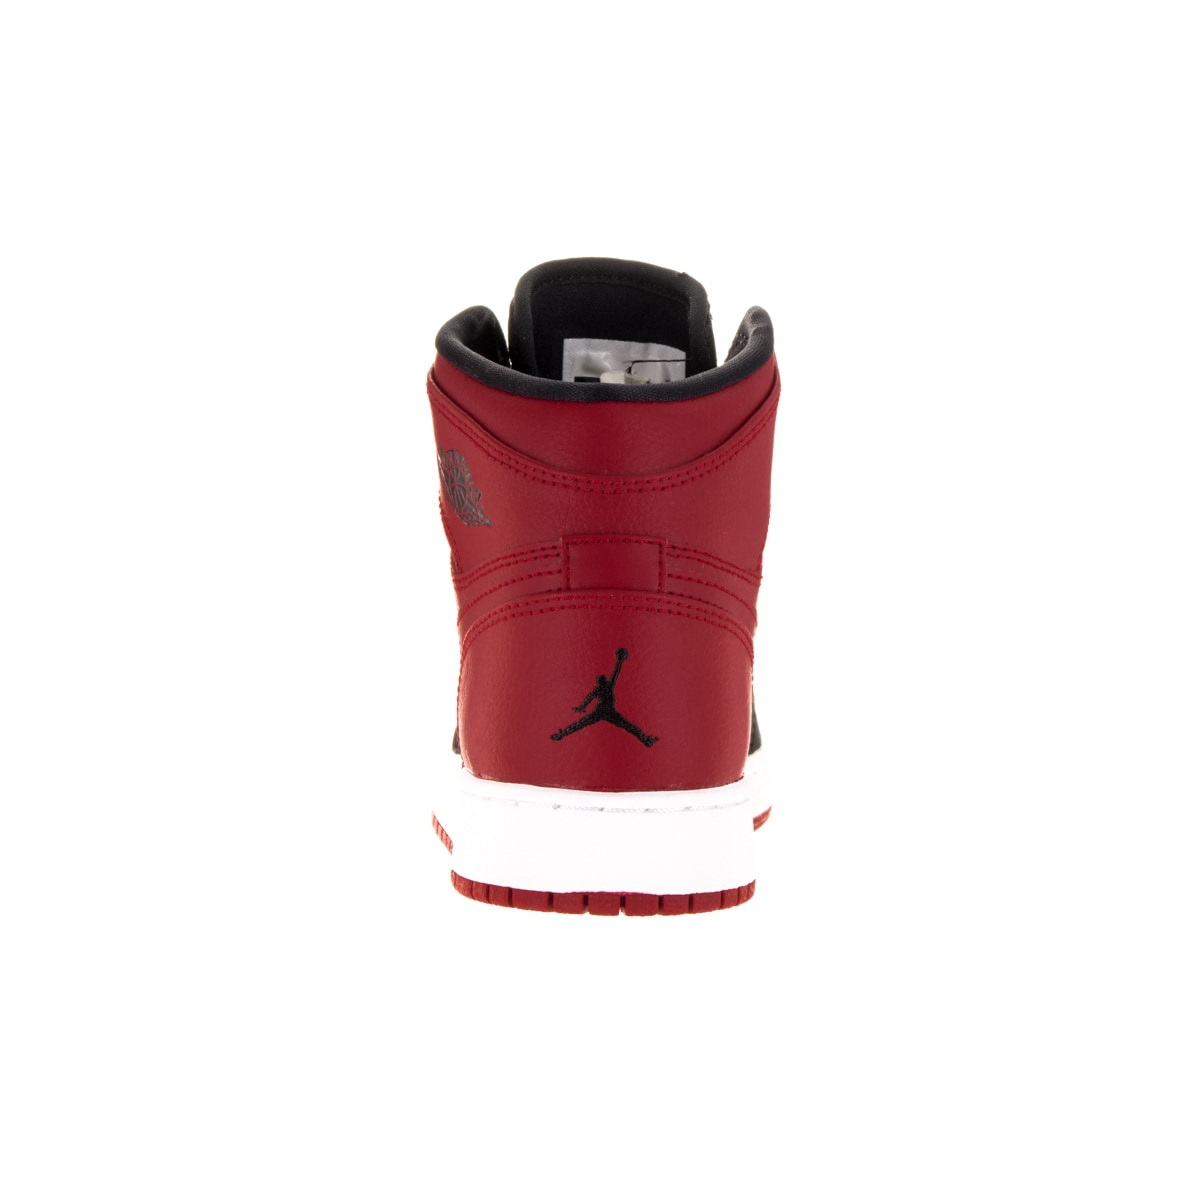 new arrival 6ddbe 4b09a Shop Nike Jordan Kid s Air Jordan 1 Retro High Bg Gym Red Black White  Basketball Shoe - Free Shipping Today - Overstock - 12322181